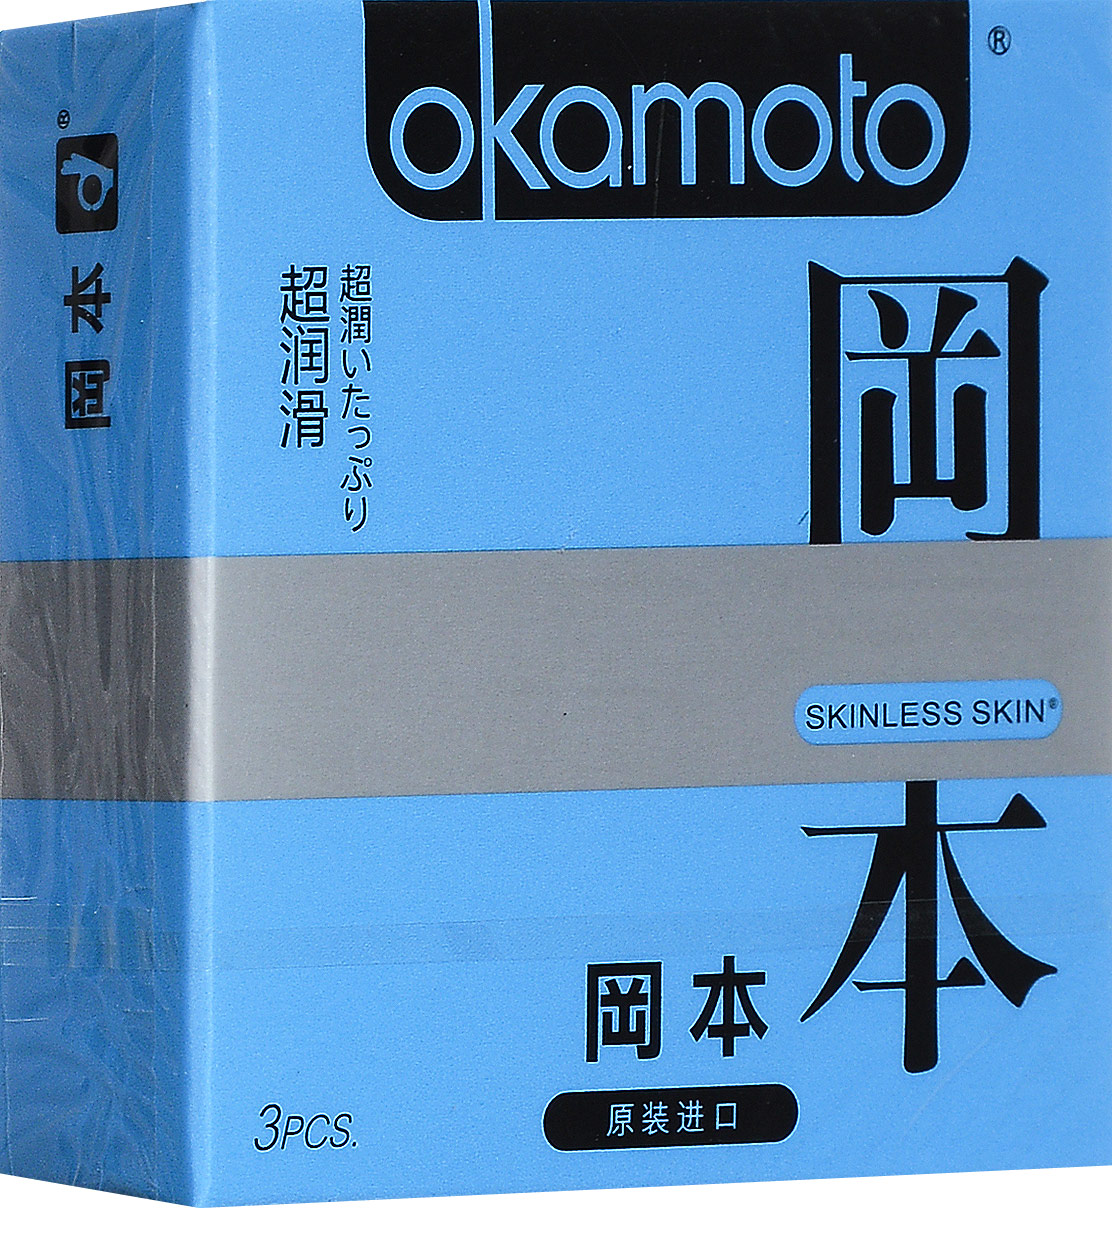 Презервативы Okamоto Skinless Skin Super Lubricative 3 шт c обильной смазкойSC-FM20104Презервативы Okamоto Skinless Skin Super Lubricative 3 шт c обильной смазкой